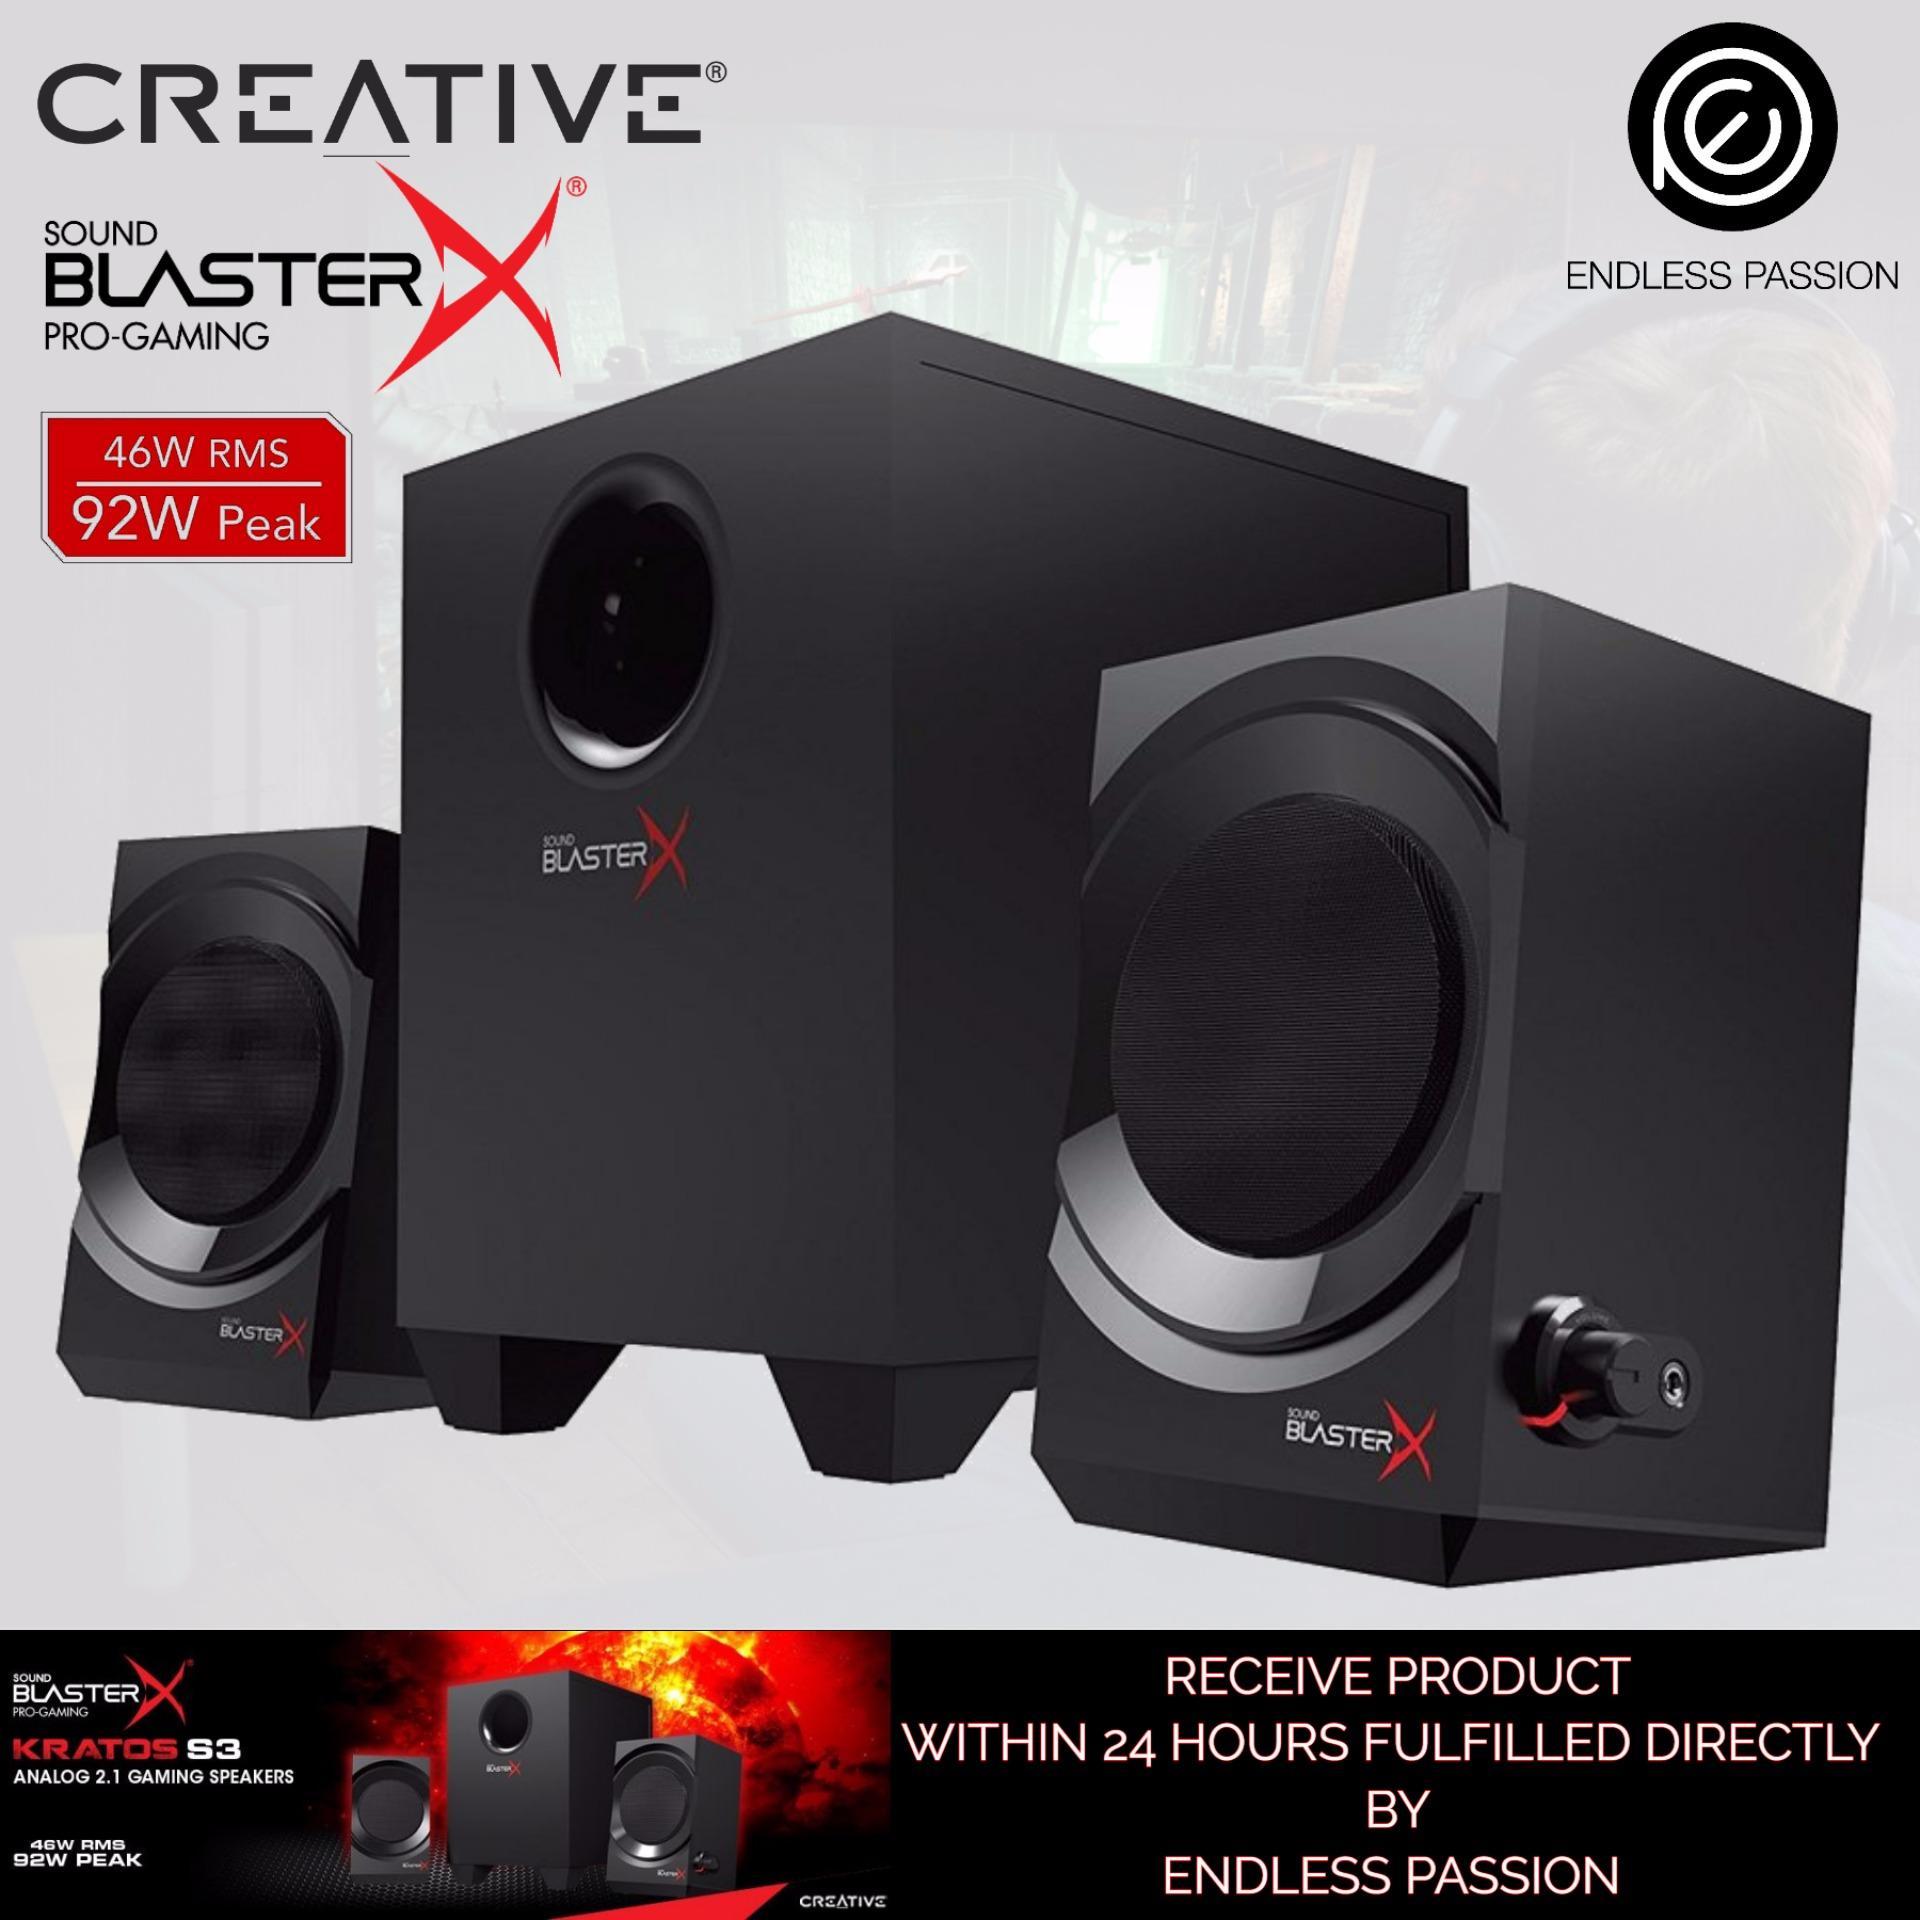 Creative Sound BlasterX Kratos S3 Analogue 21 Gaming Speaker System